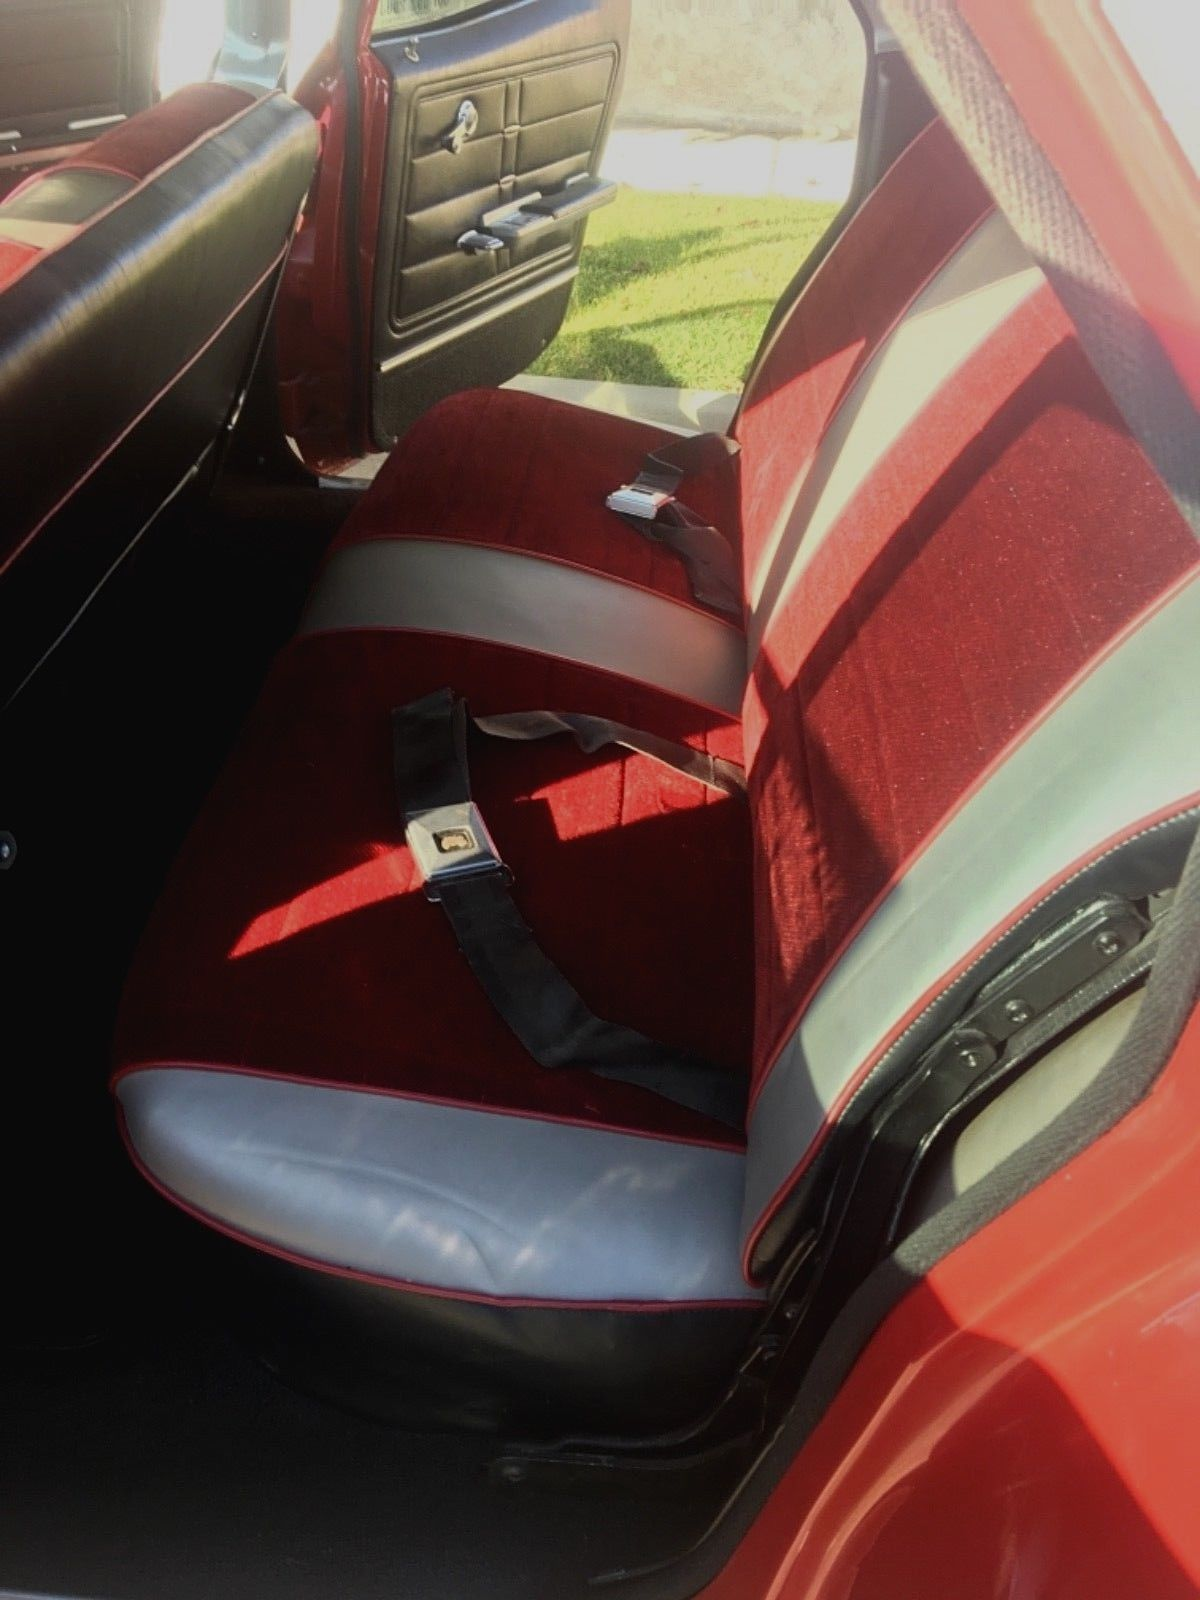 1966 Impala Wagon interior